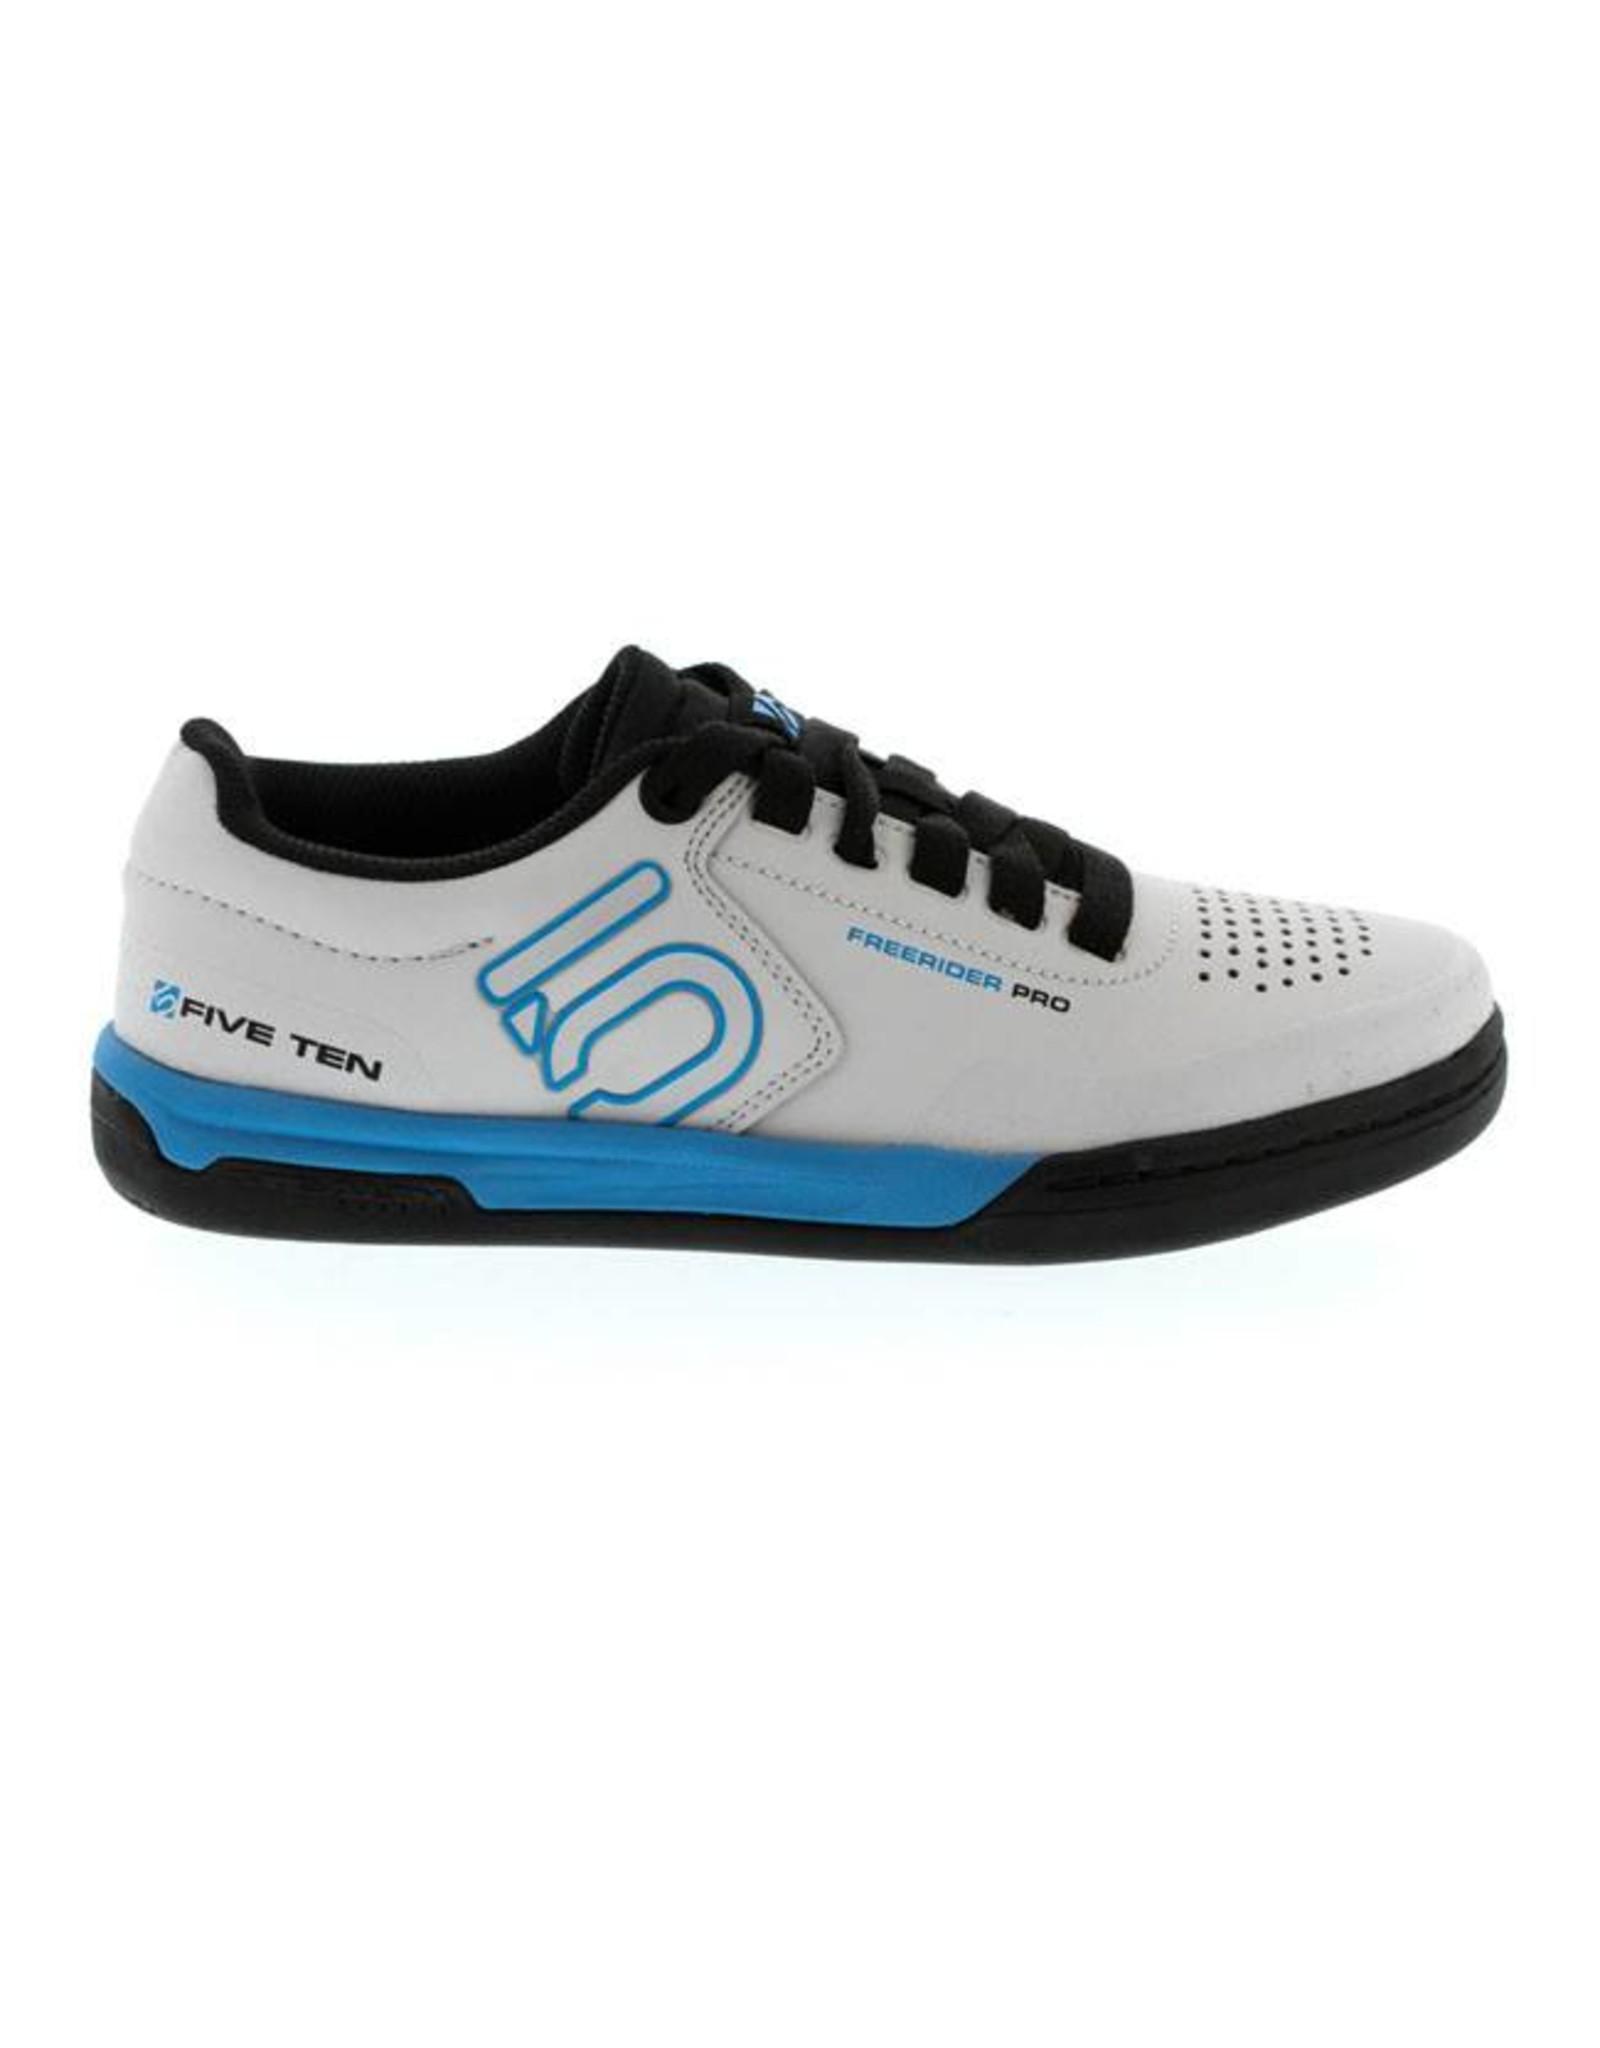 Five Ten Five Ten Freerider Pro Women's Flat Pedal Shoe: Solid Gray 10